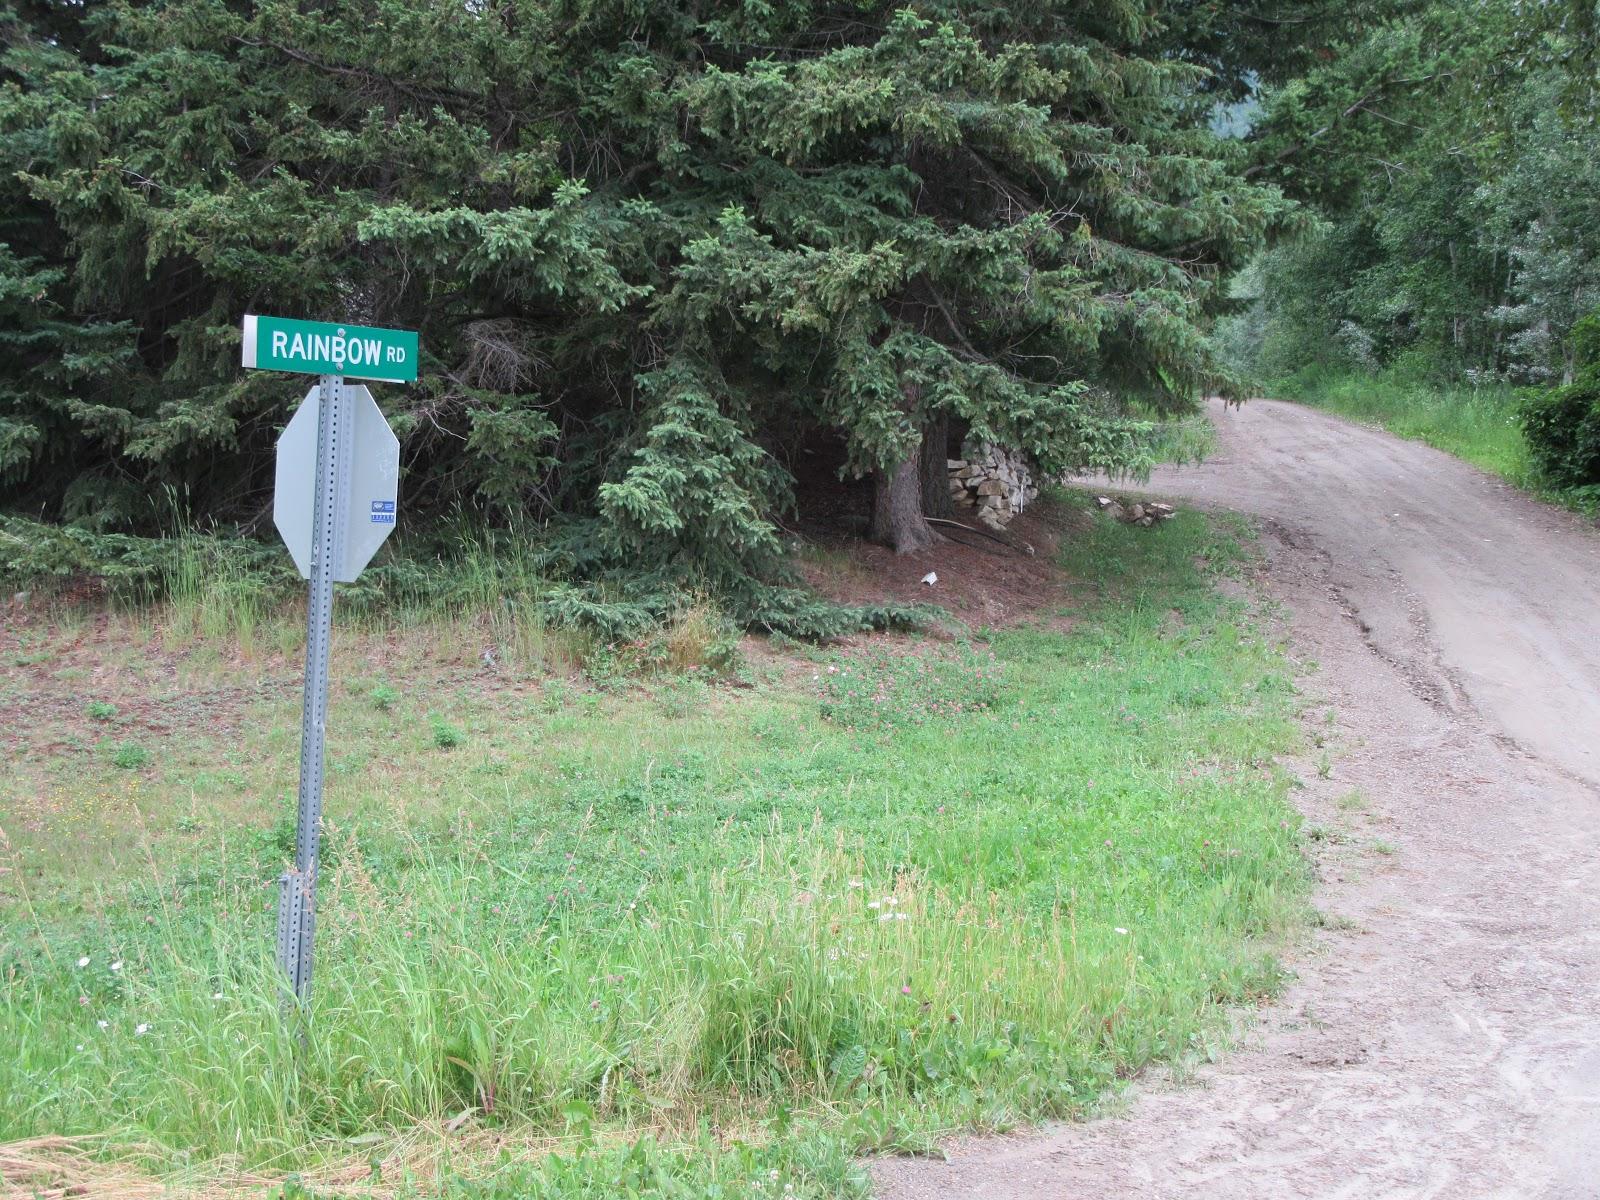 Cycling McBride Peak - road sign and road at start